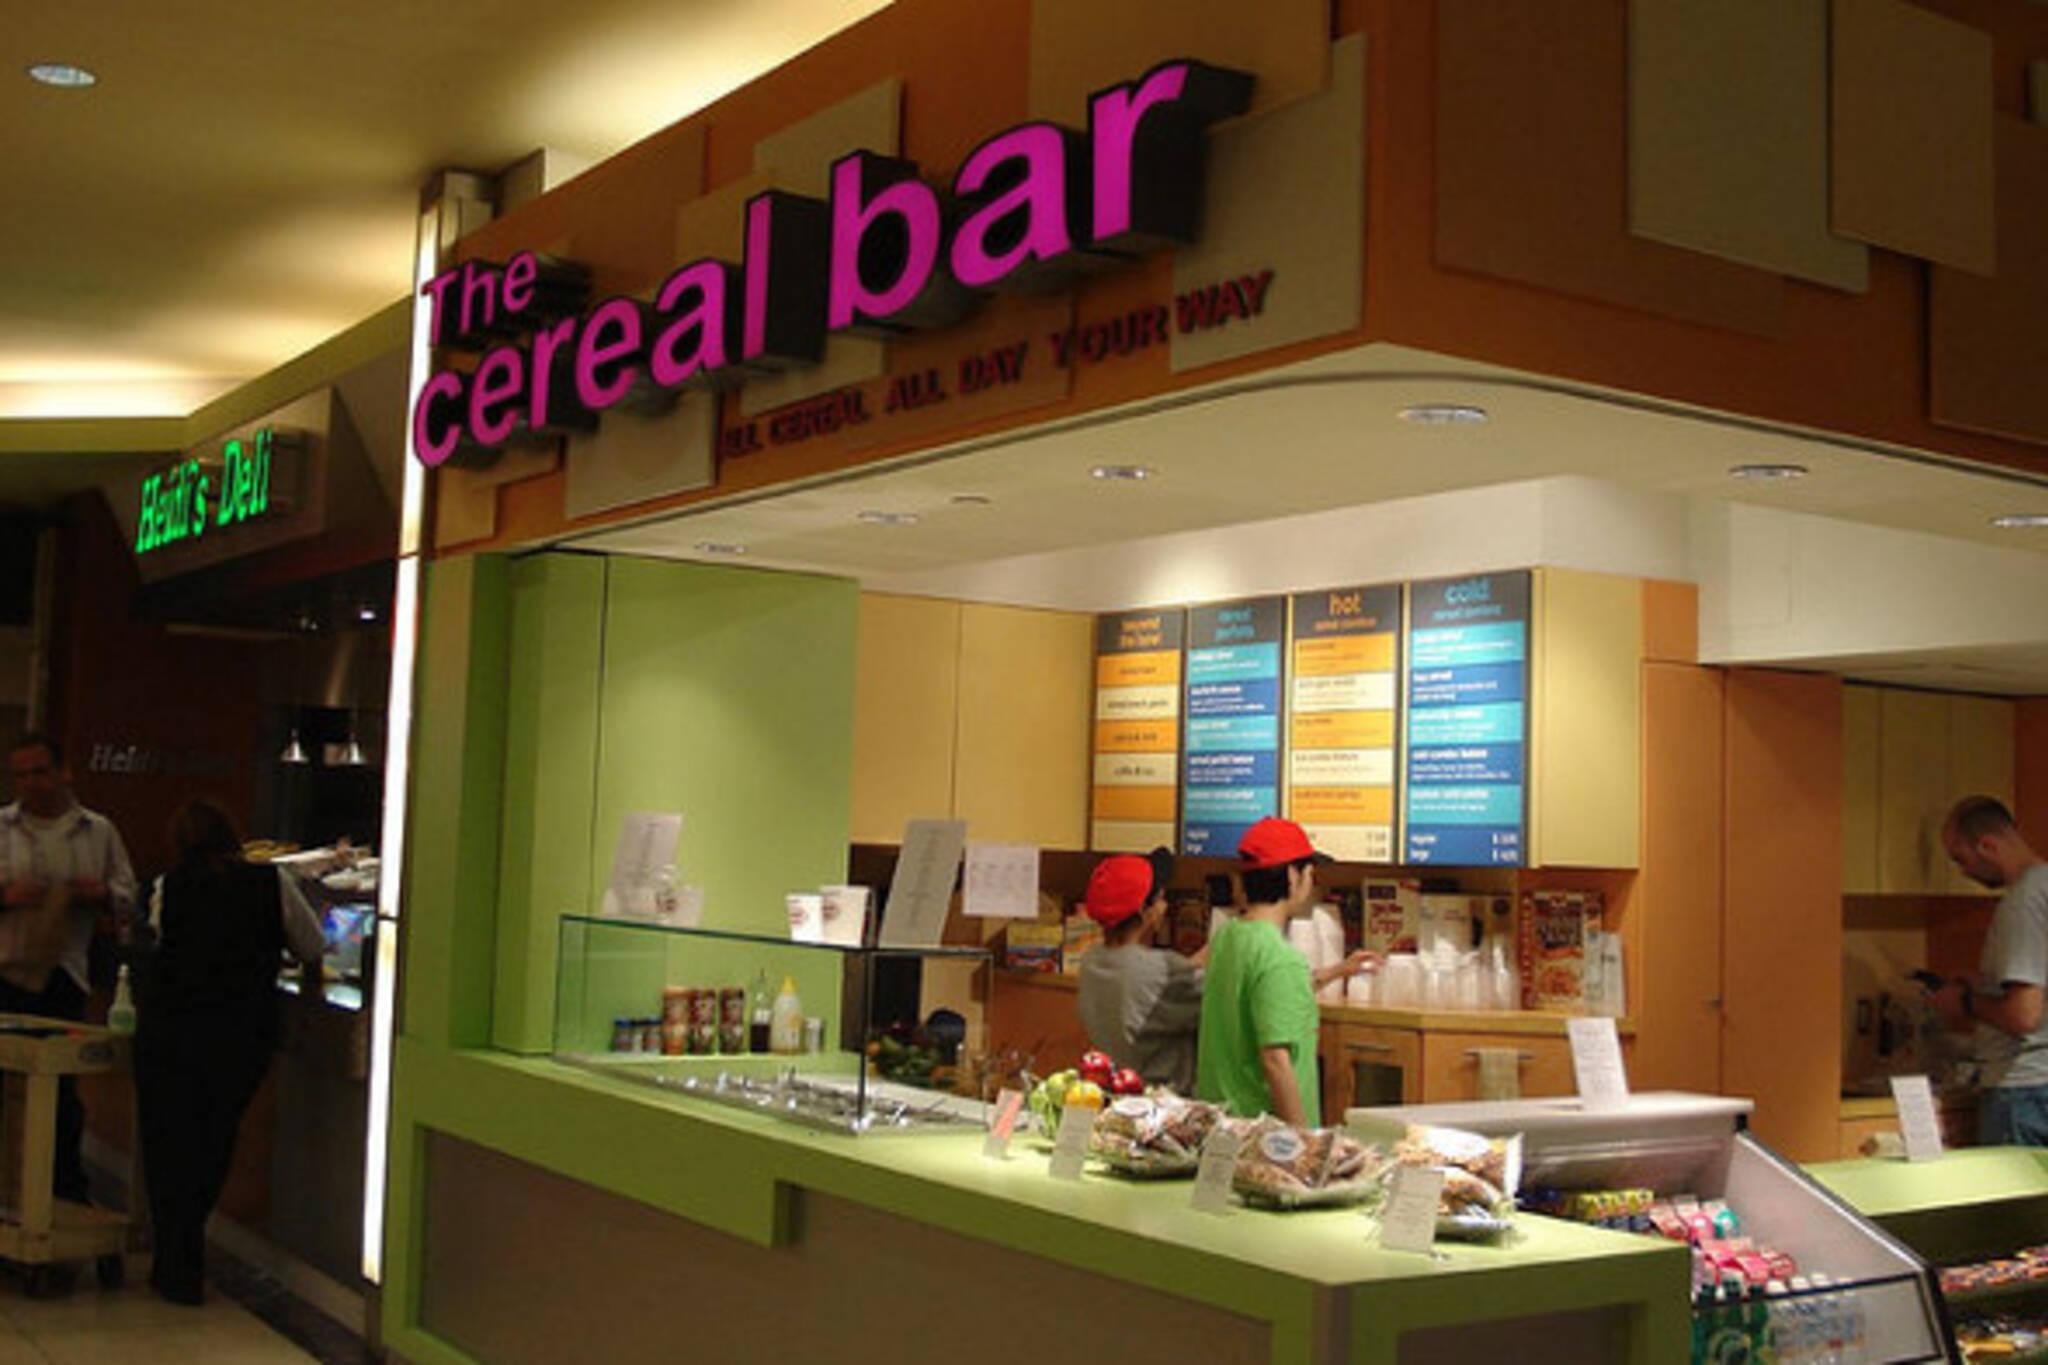 cereal bar toronto